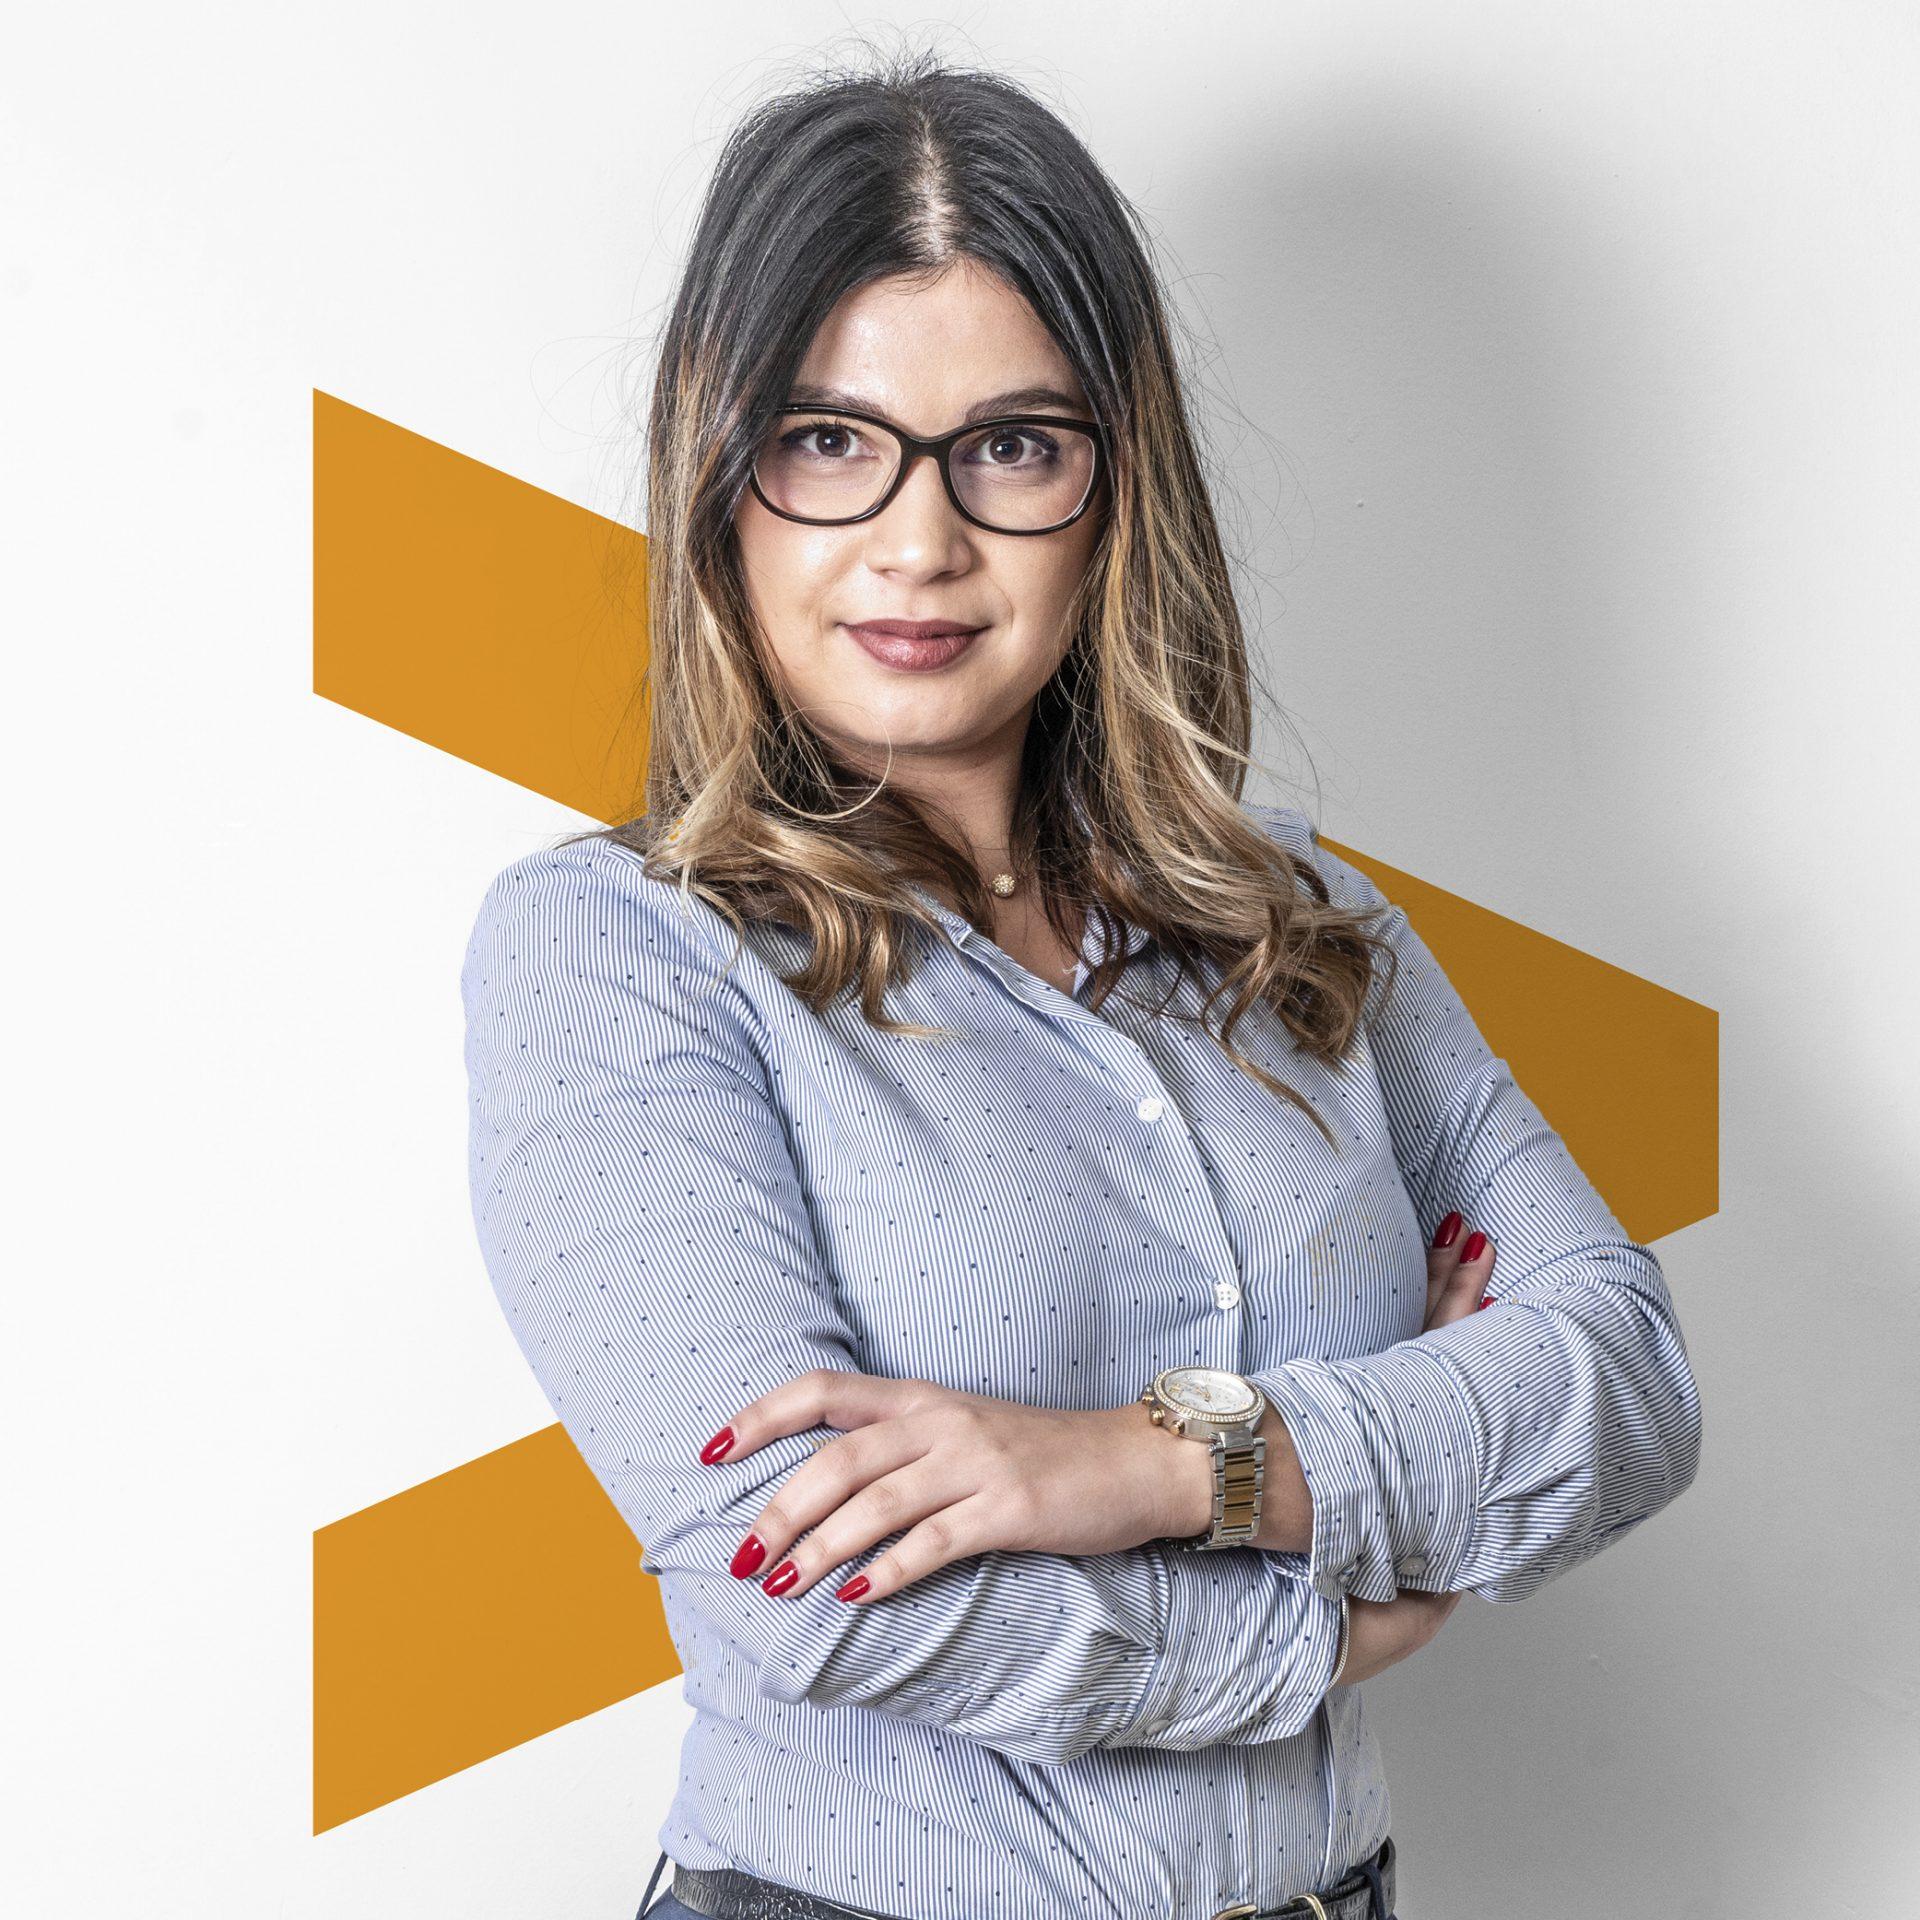 Francesca Gherghisan